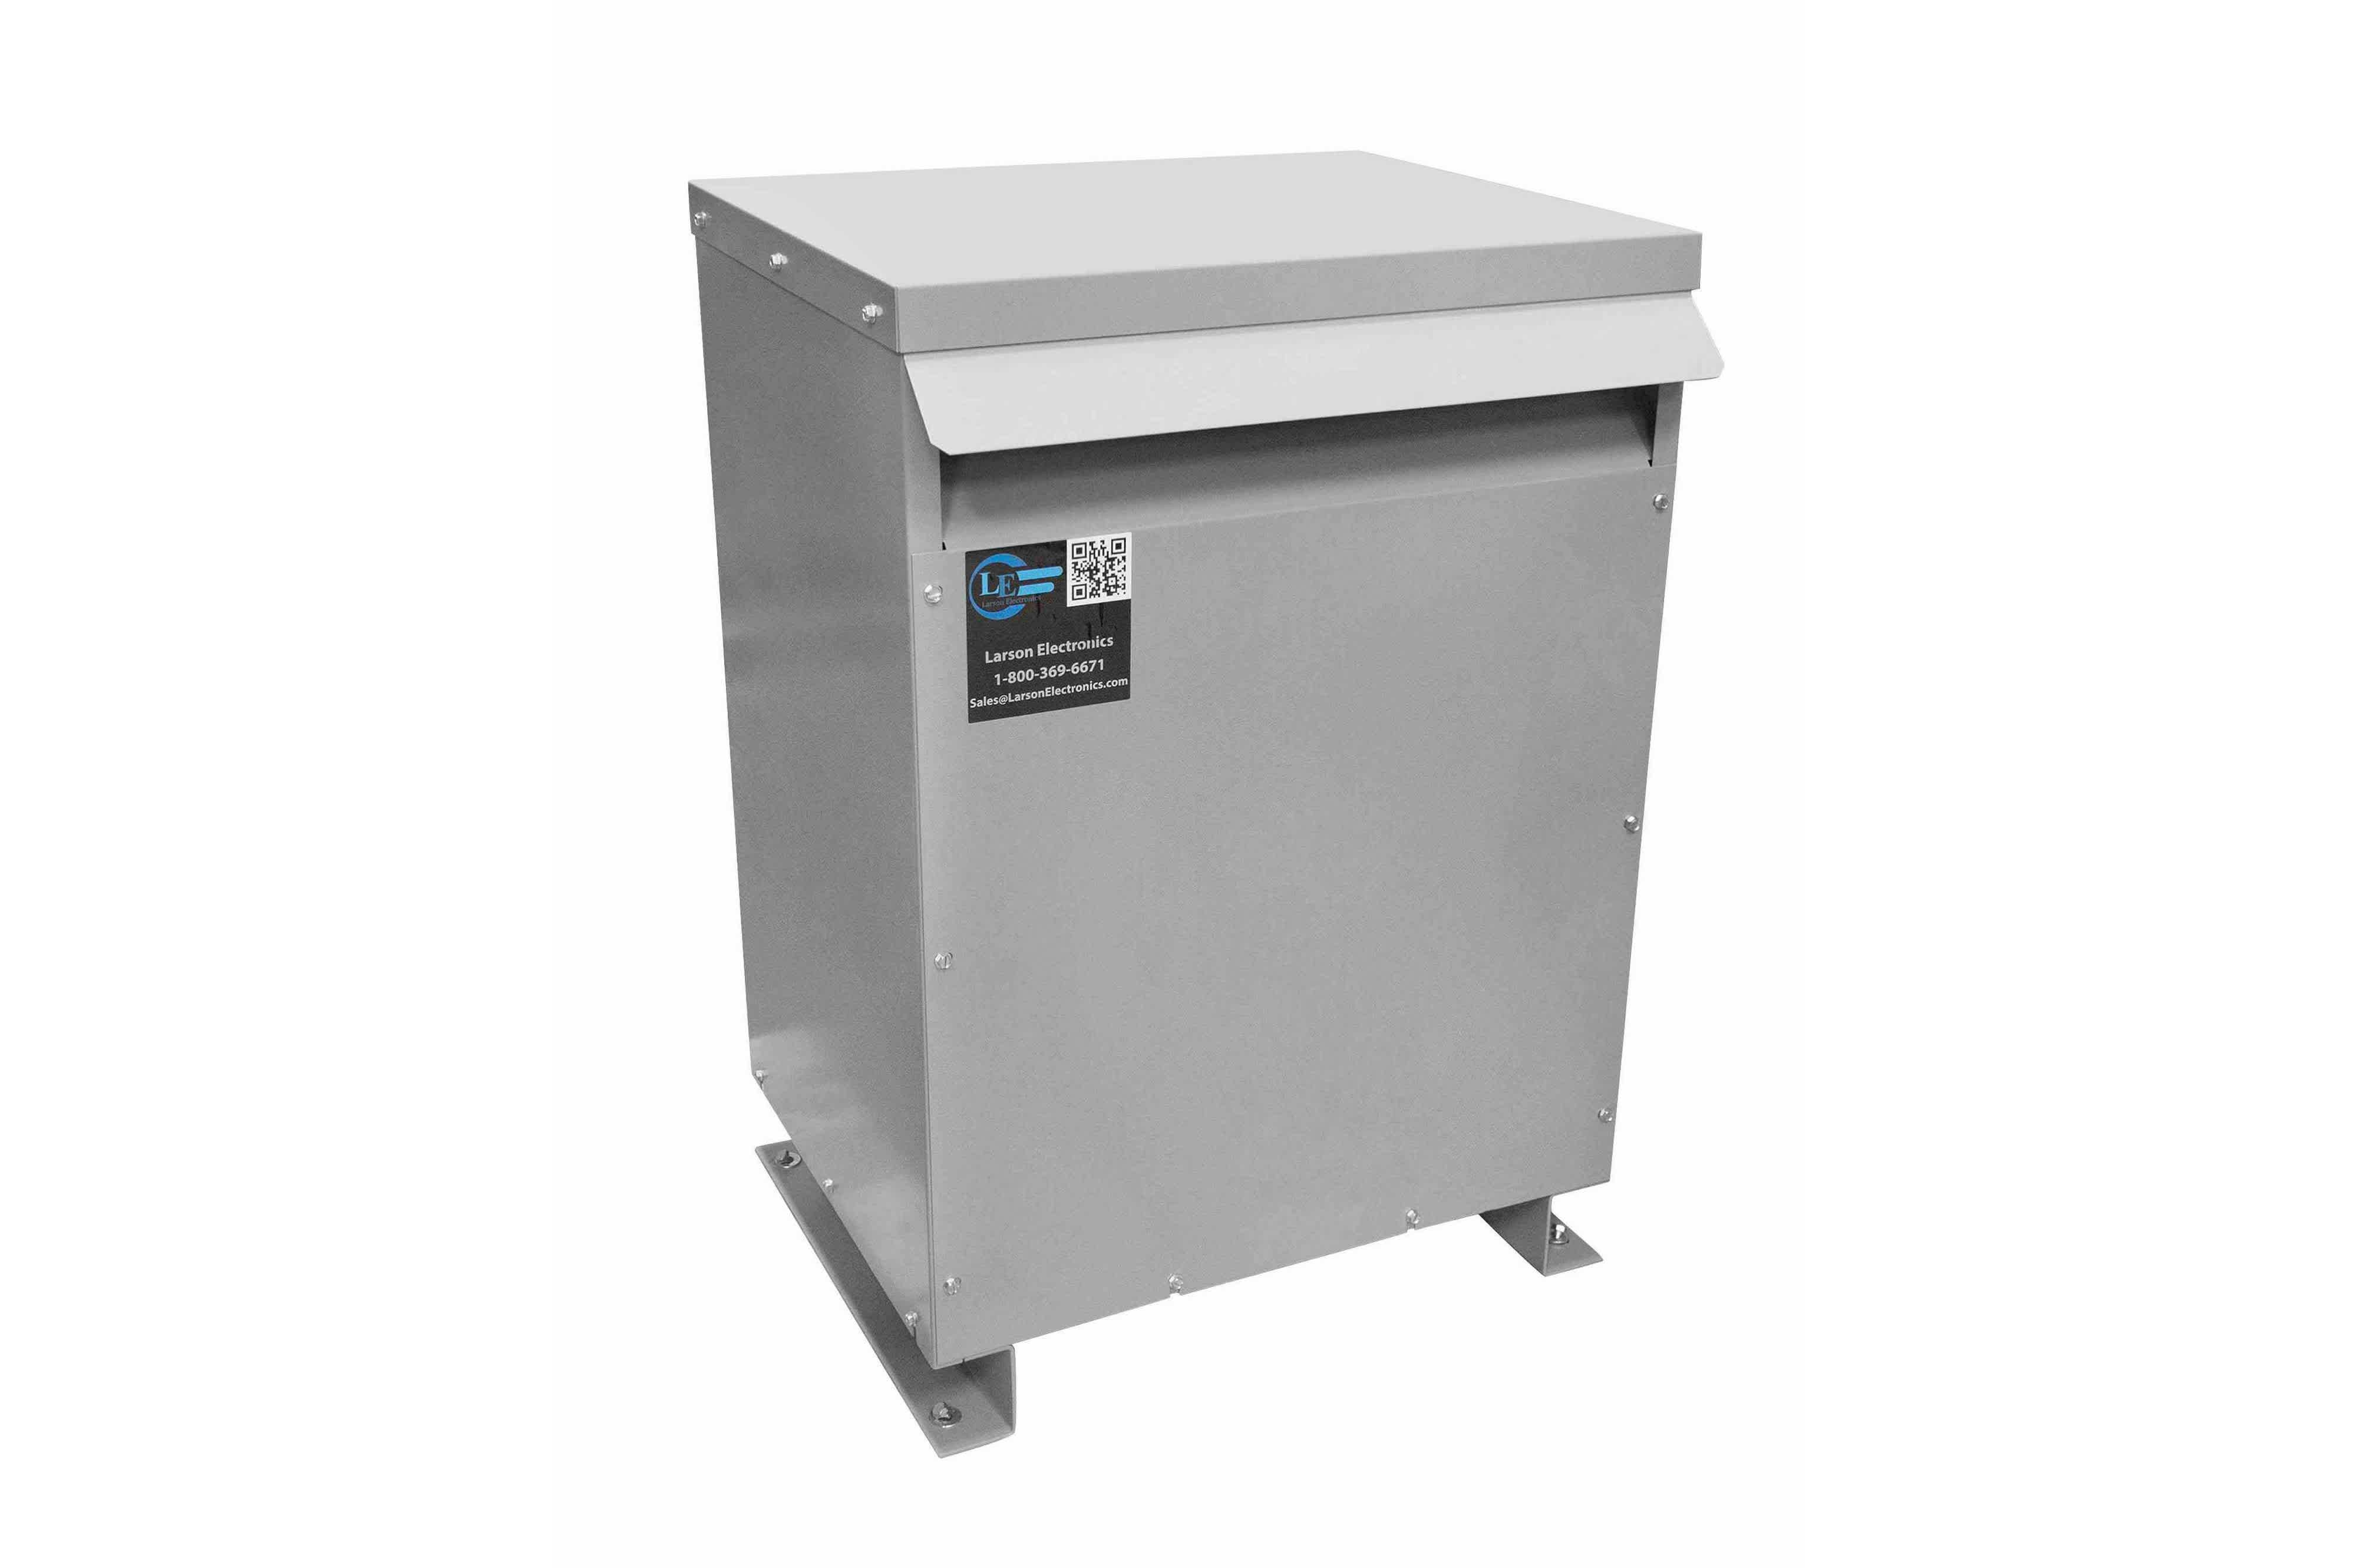 112.5 kVA 3PH Isolation Transformer, 230V Wye Primary, 208V Delta Secondary, N3R, Ventilated, 60 Hz